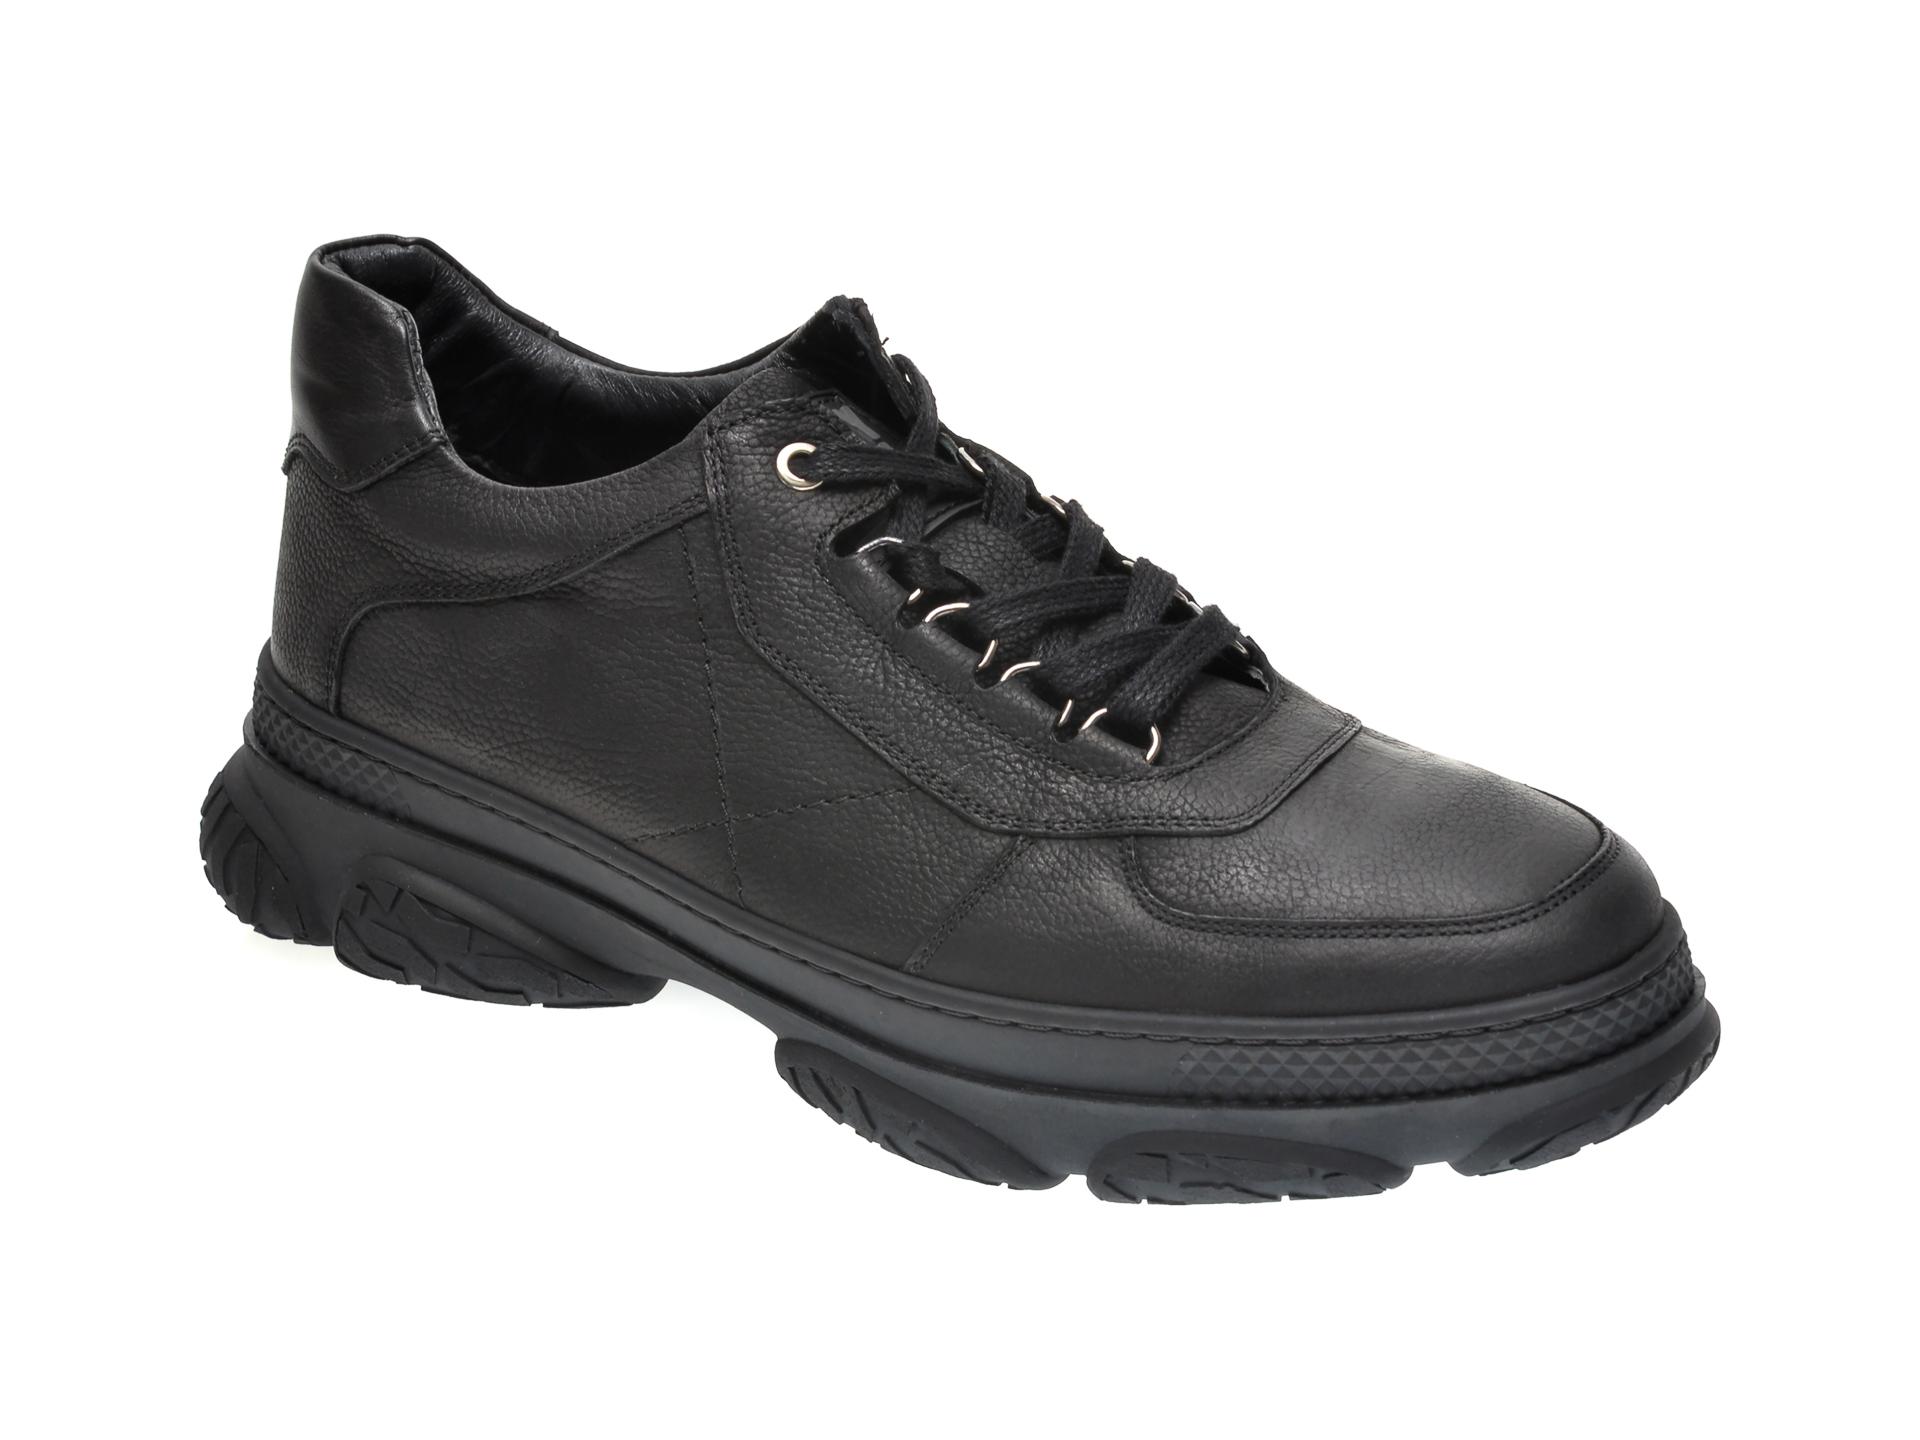 Pantofi Otter Negri, 28402, Din Nabuc